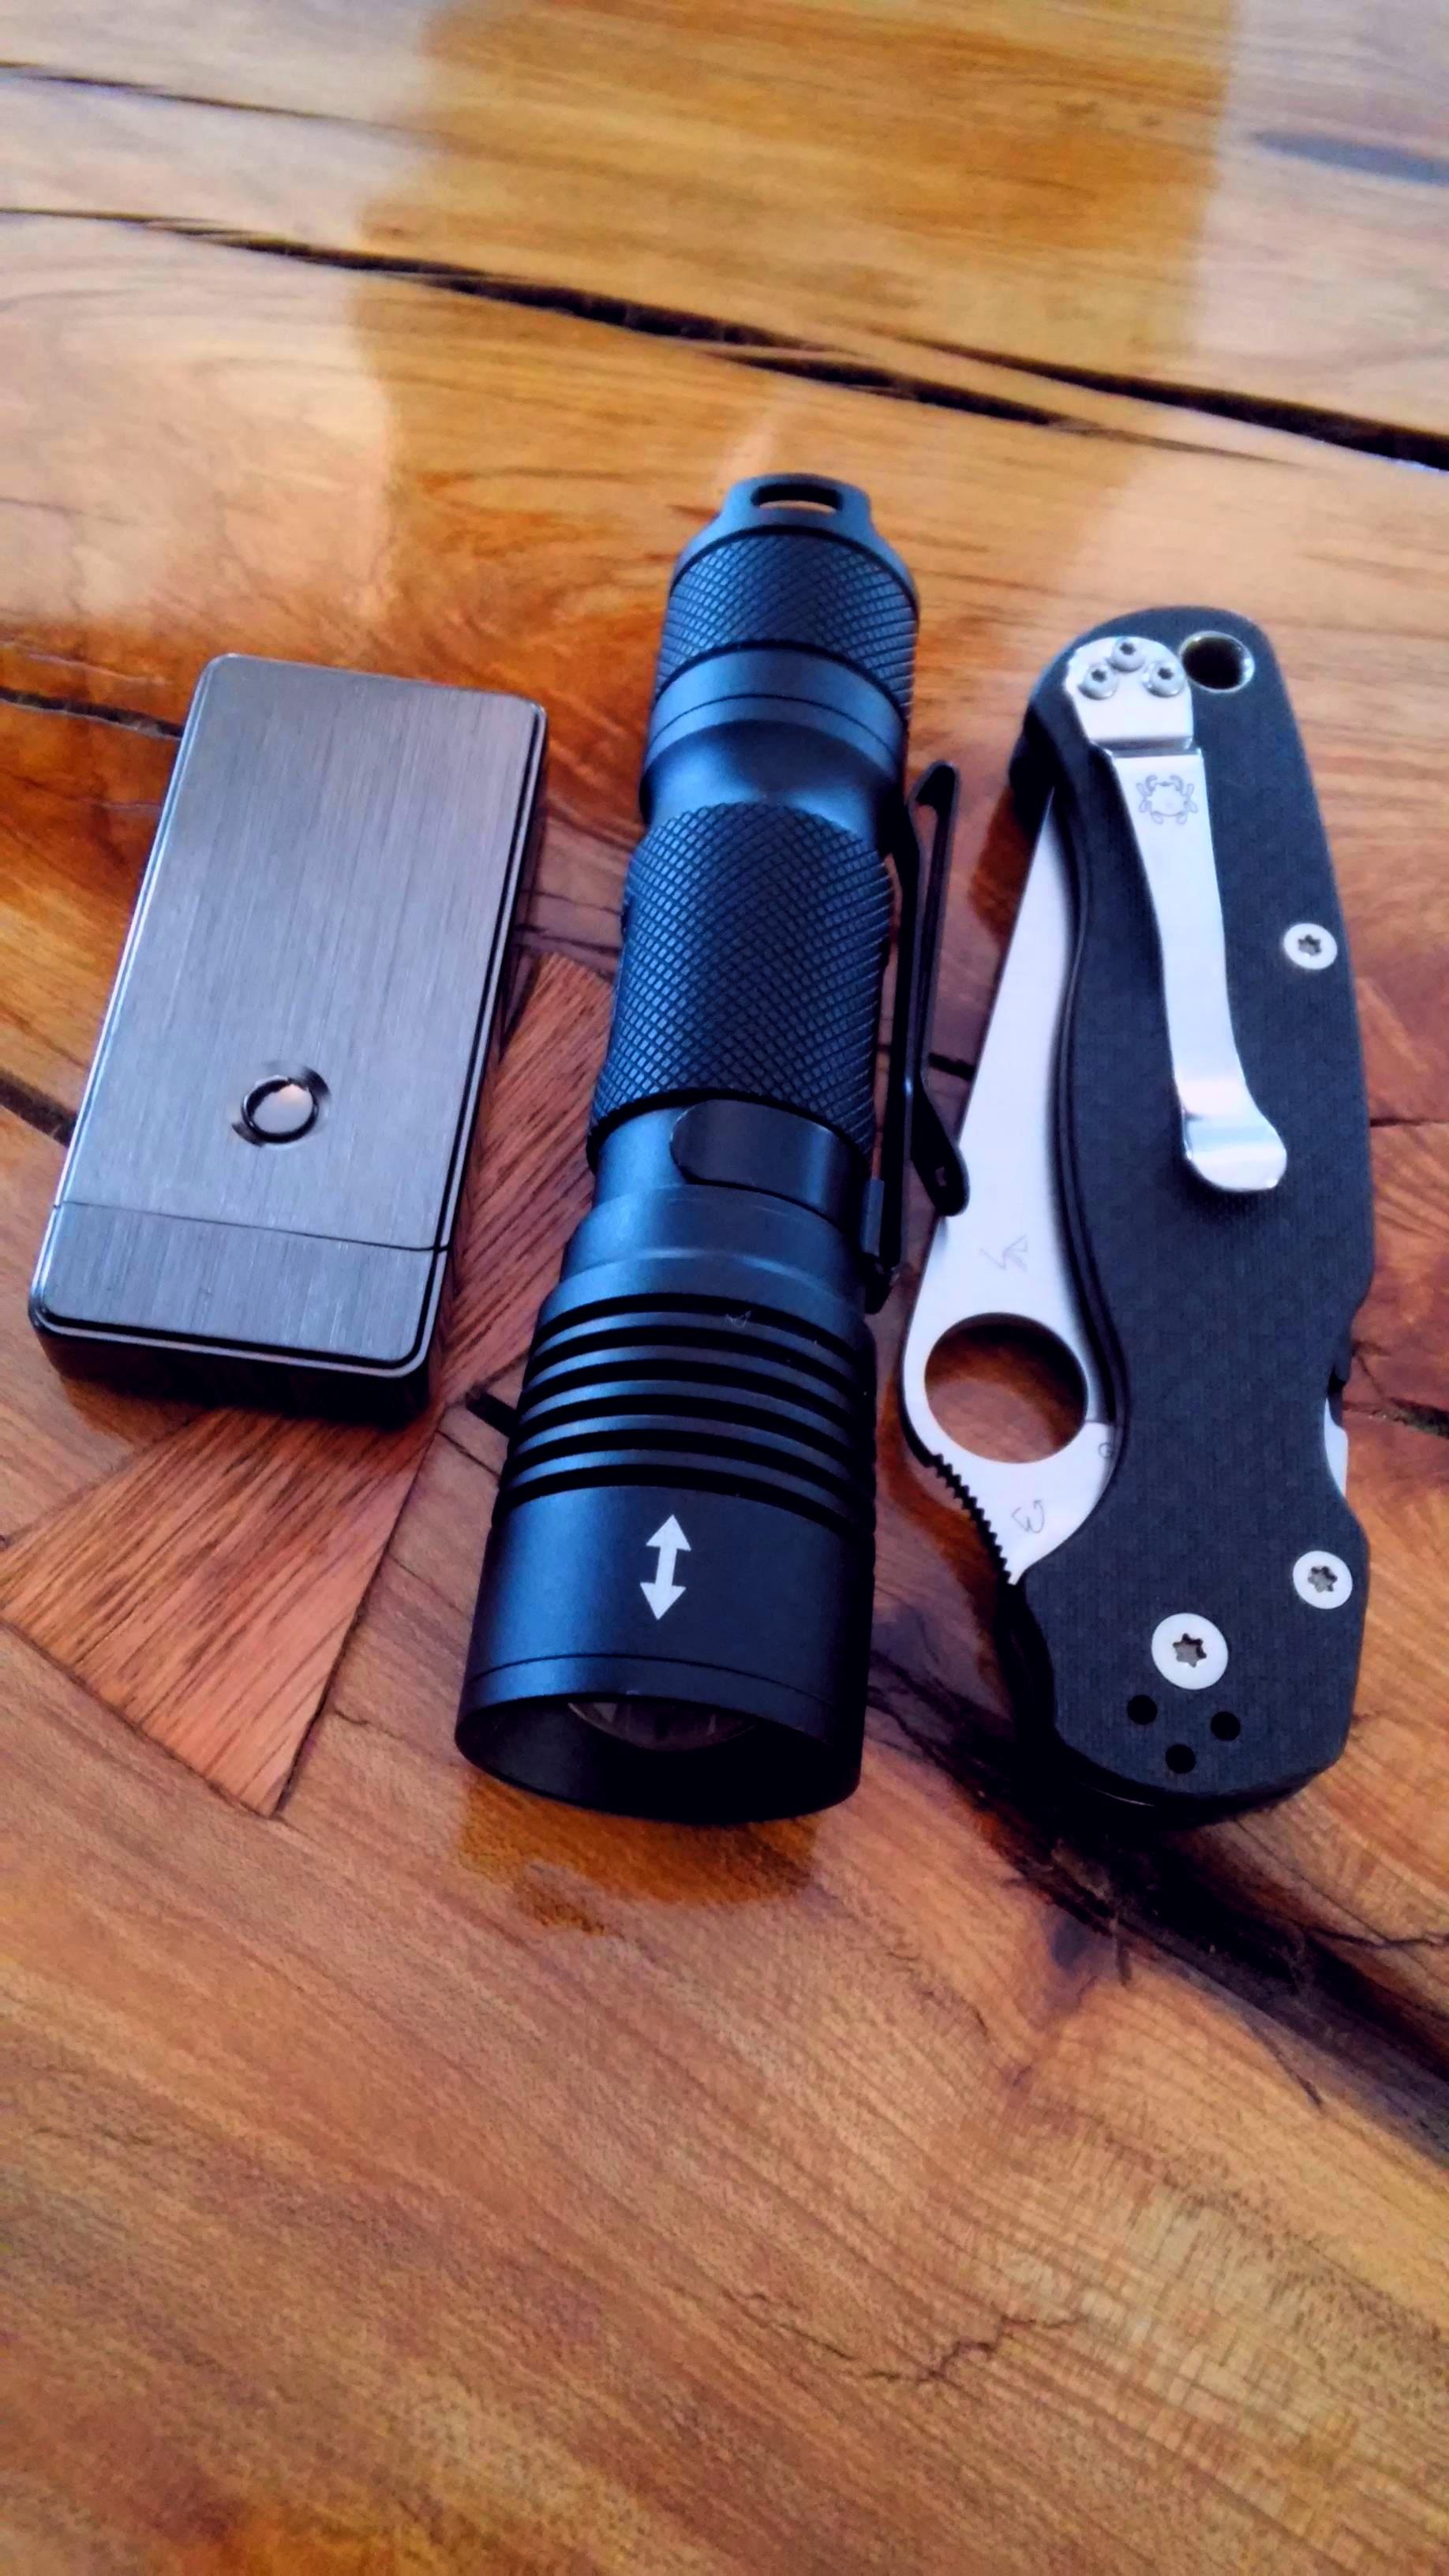 100Kcd Zoomie, Carbon Fiber S90v Spyderco Paramilitary2, Tesla lighter